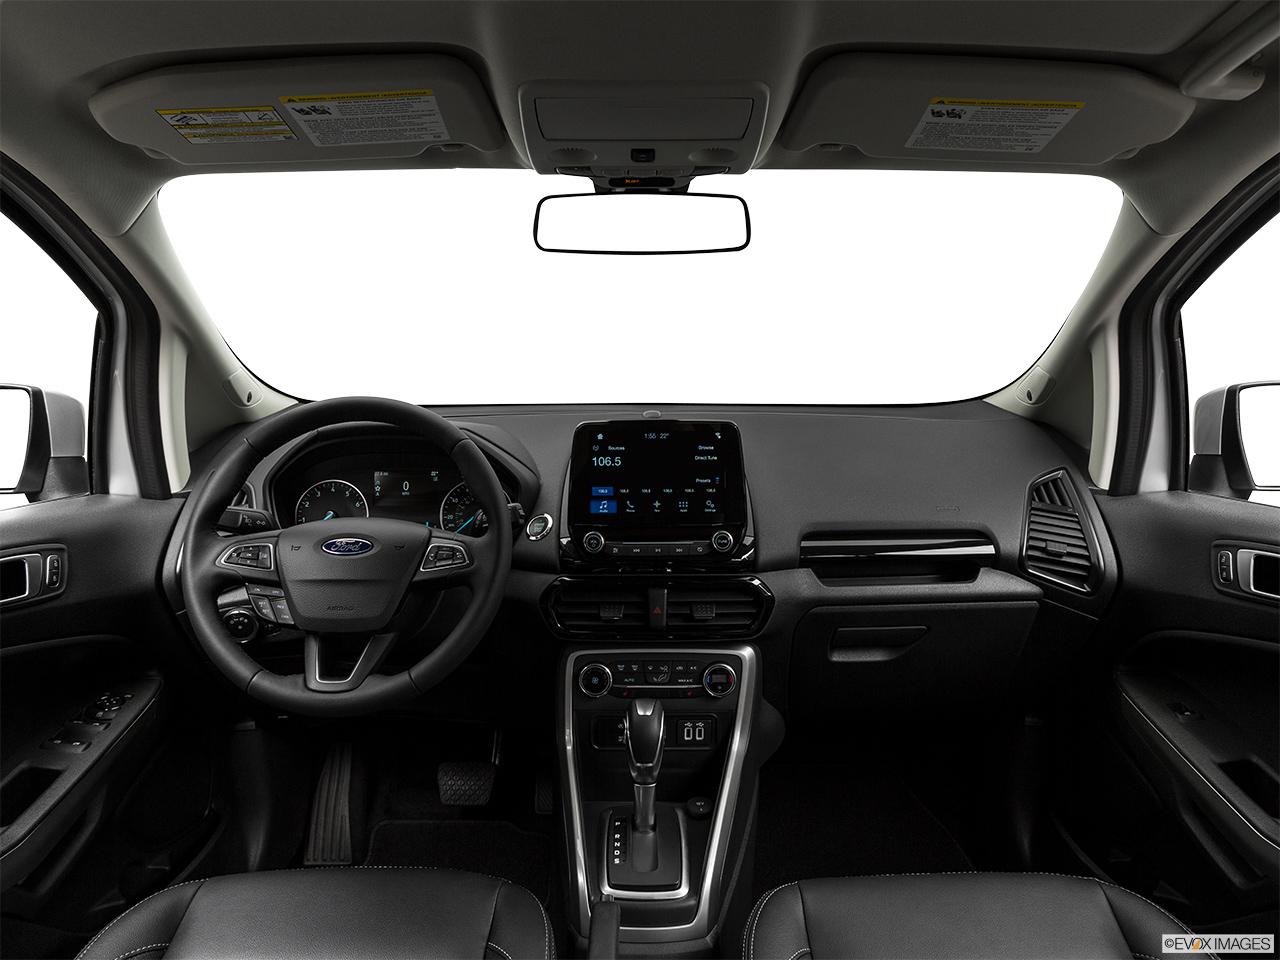 Ford EcoSport 2018 1.5 Titanium, Saudi Arabia, Centered wide dash shot